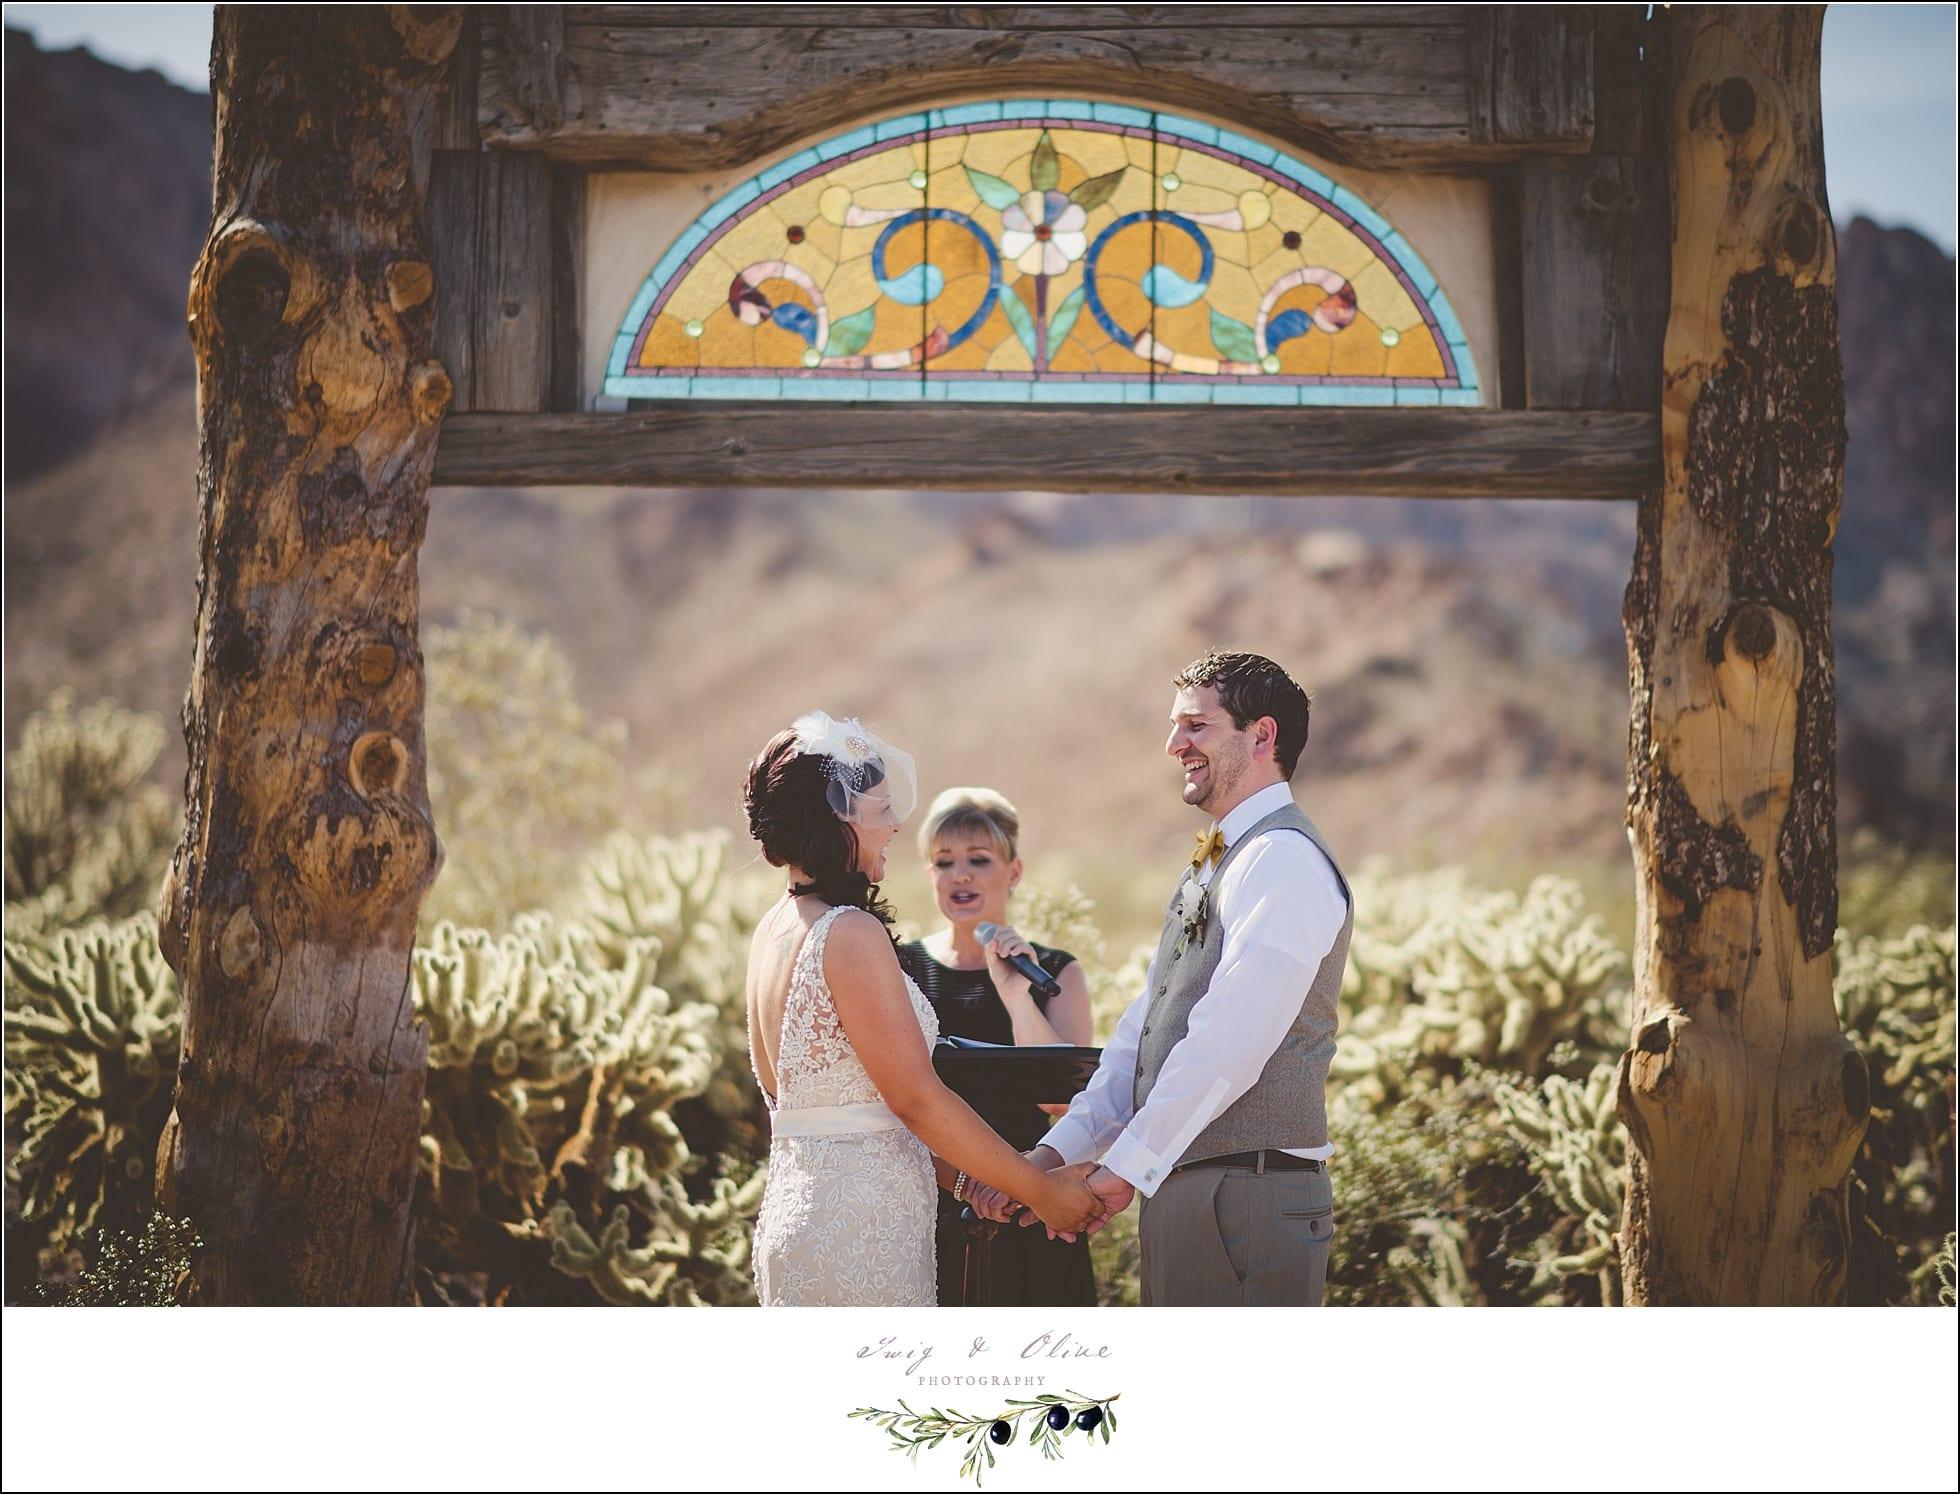 Wedding Photography Las Vegas Nevada: Twig & Olive PhotographyNelson Nevada Ghost Town Wedding